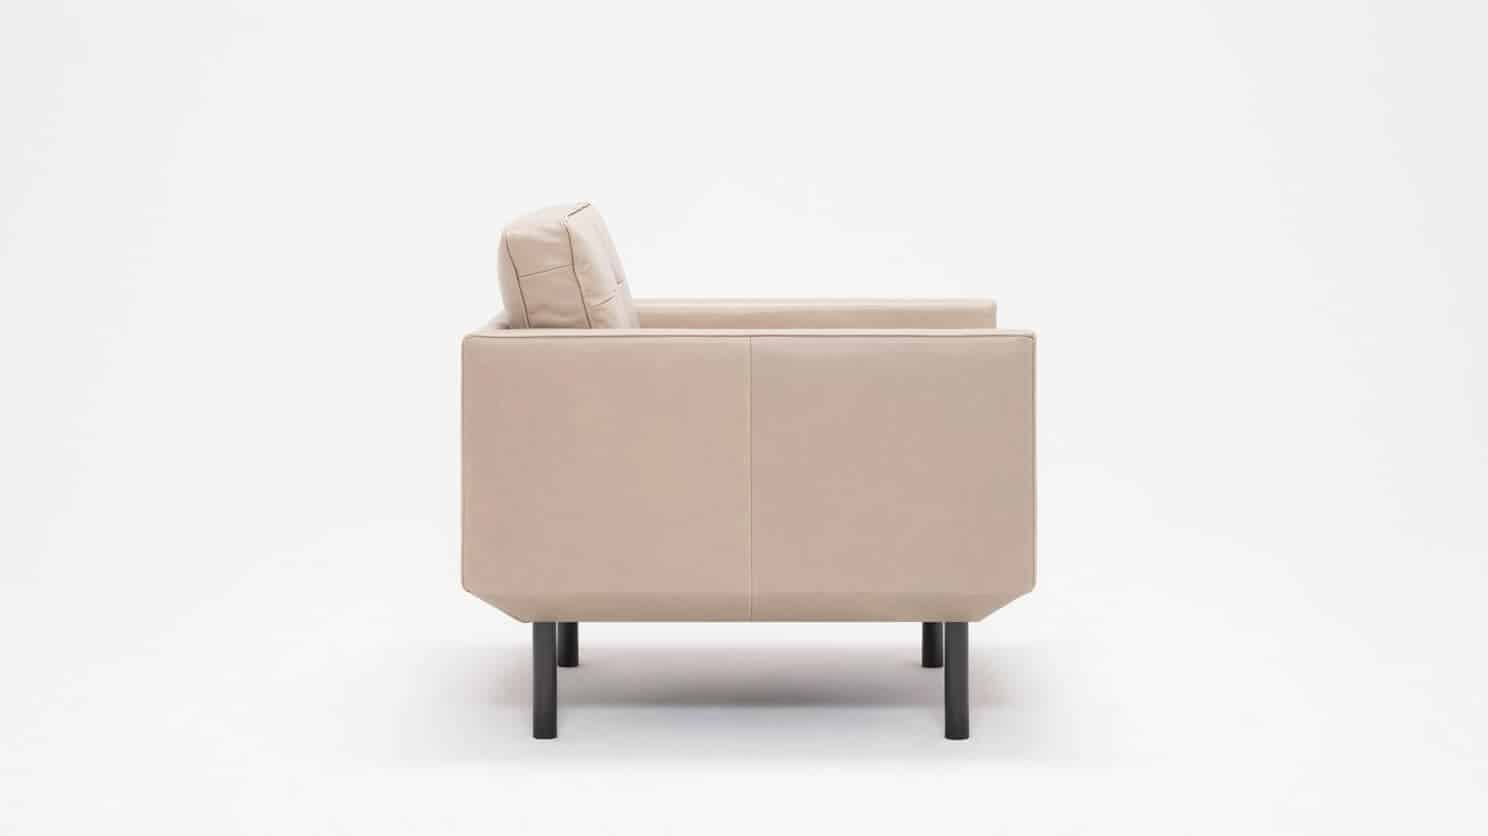 37155 95 par bp 4 chairs plateau club chair foam coachella warm grey side 01